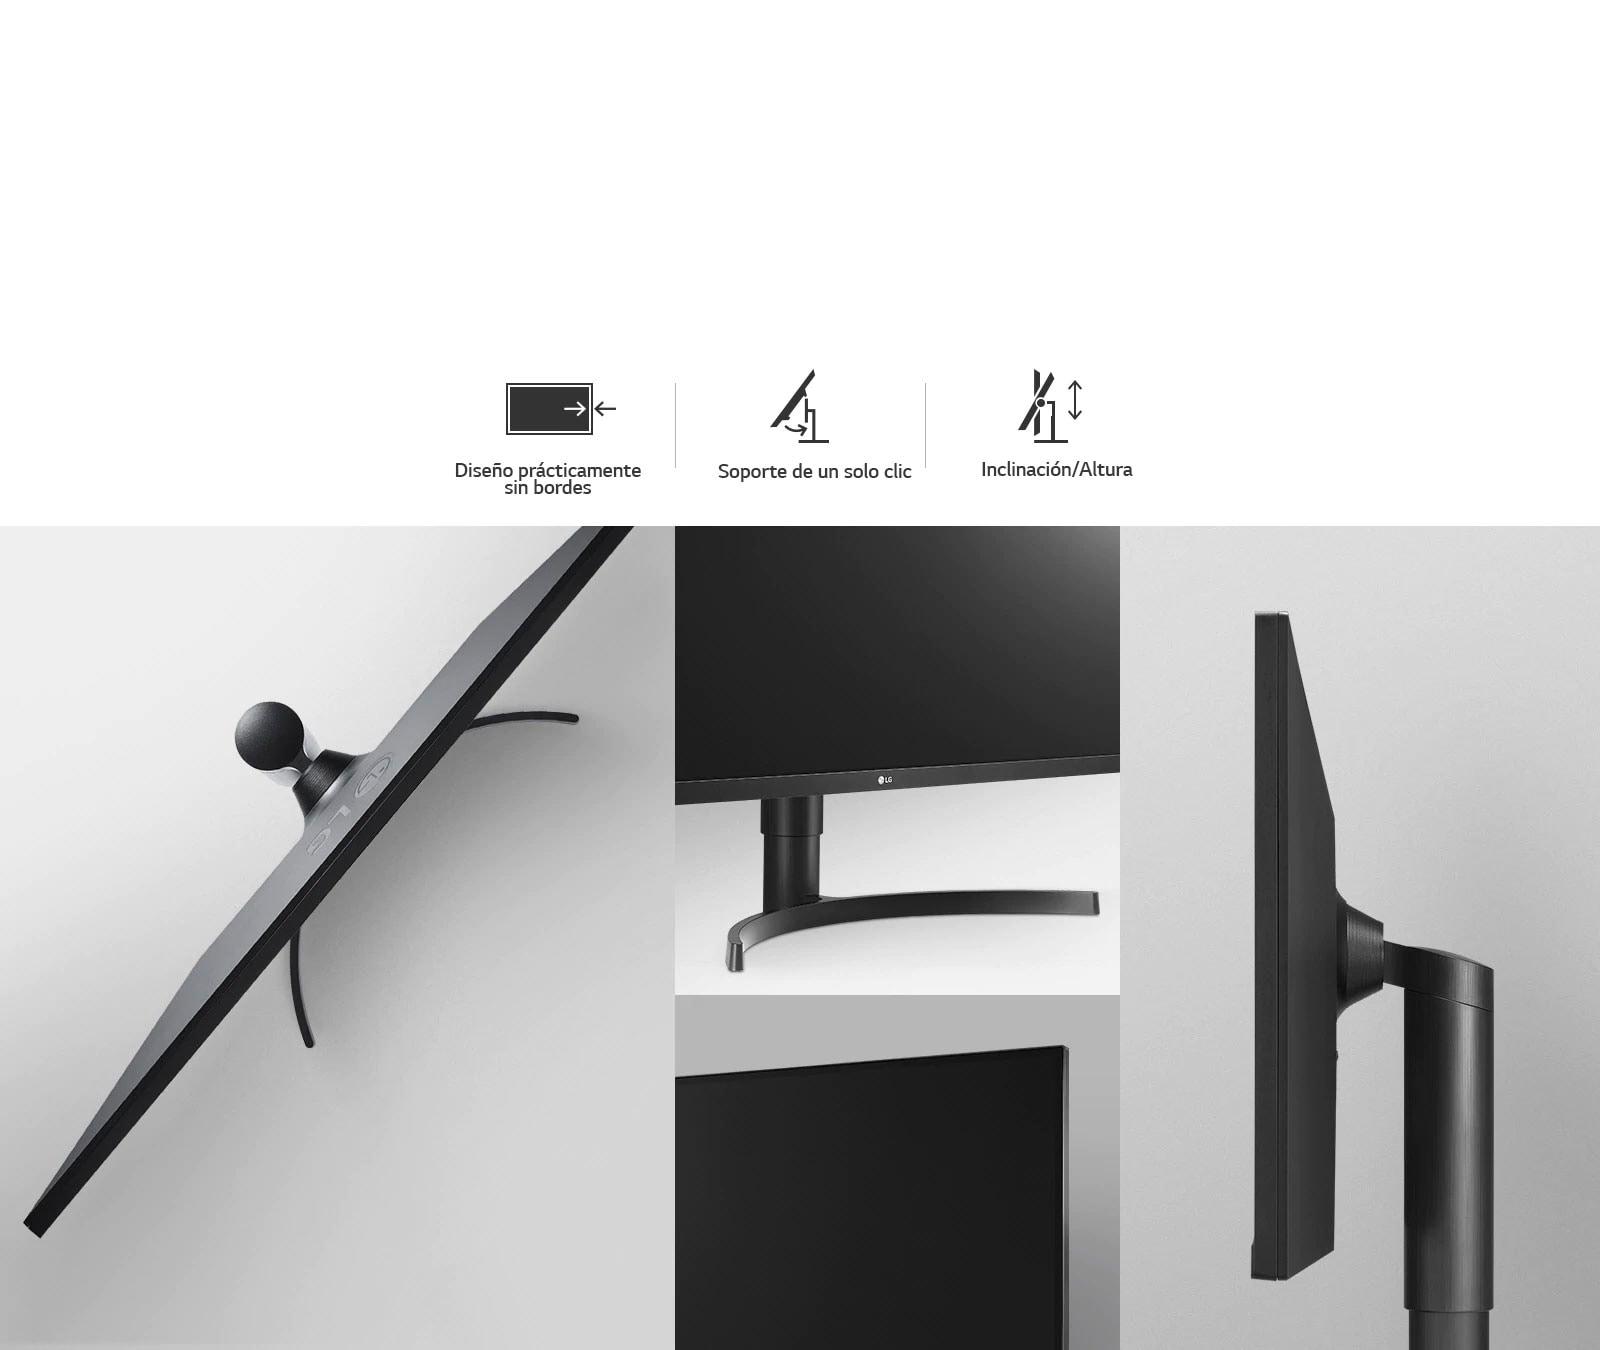 Diseño ergonómico